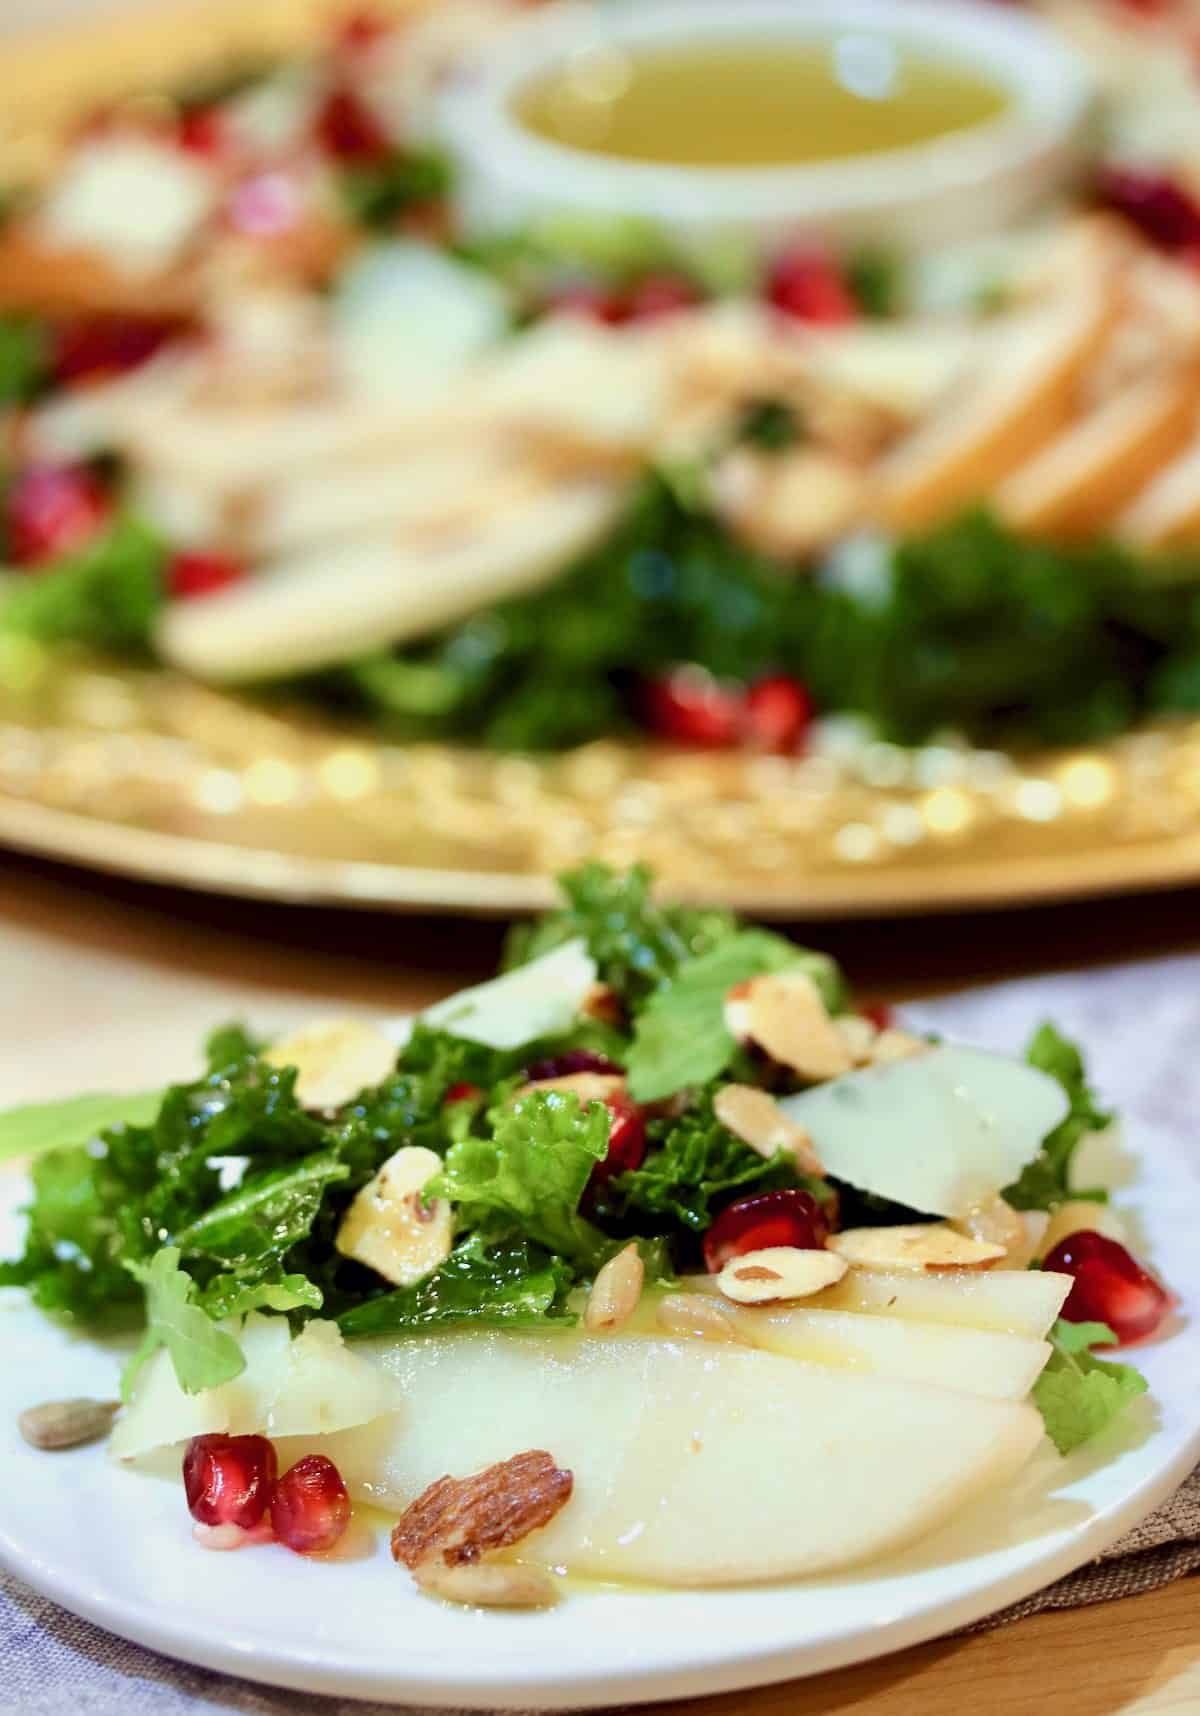 pears, kale, pomegranate seeds, nuts salad plated